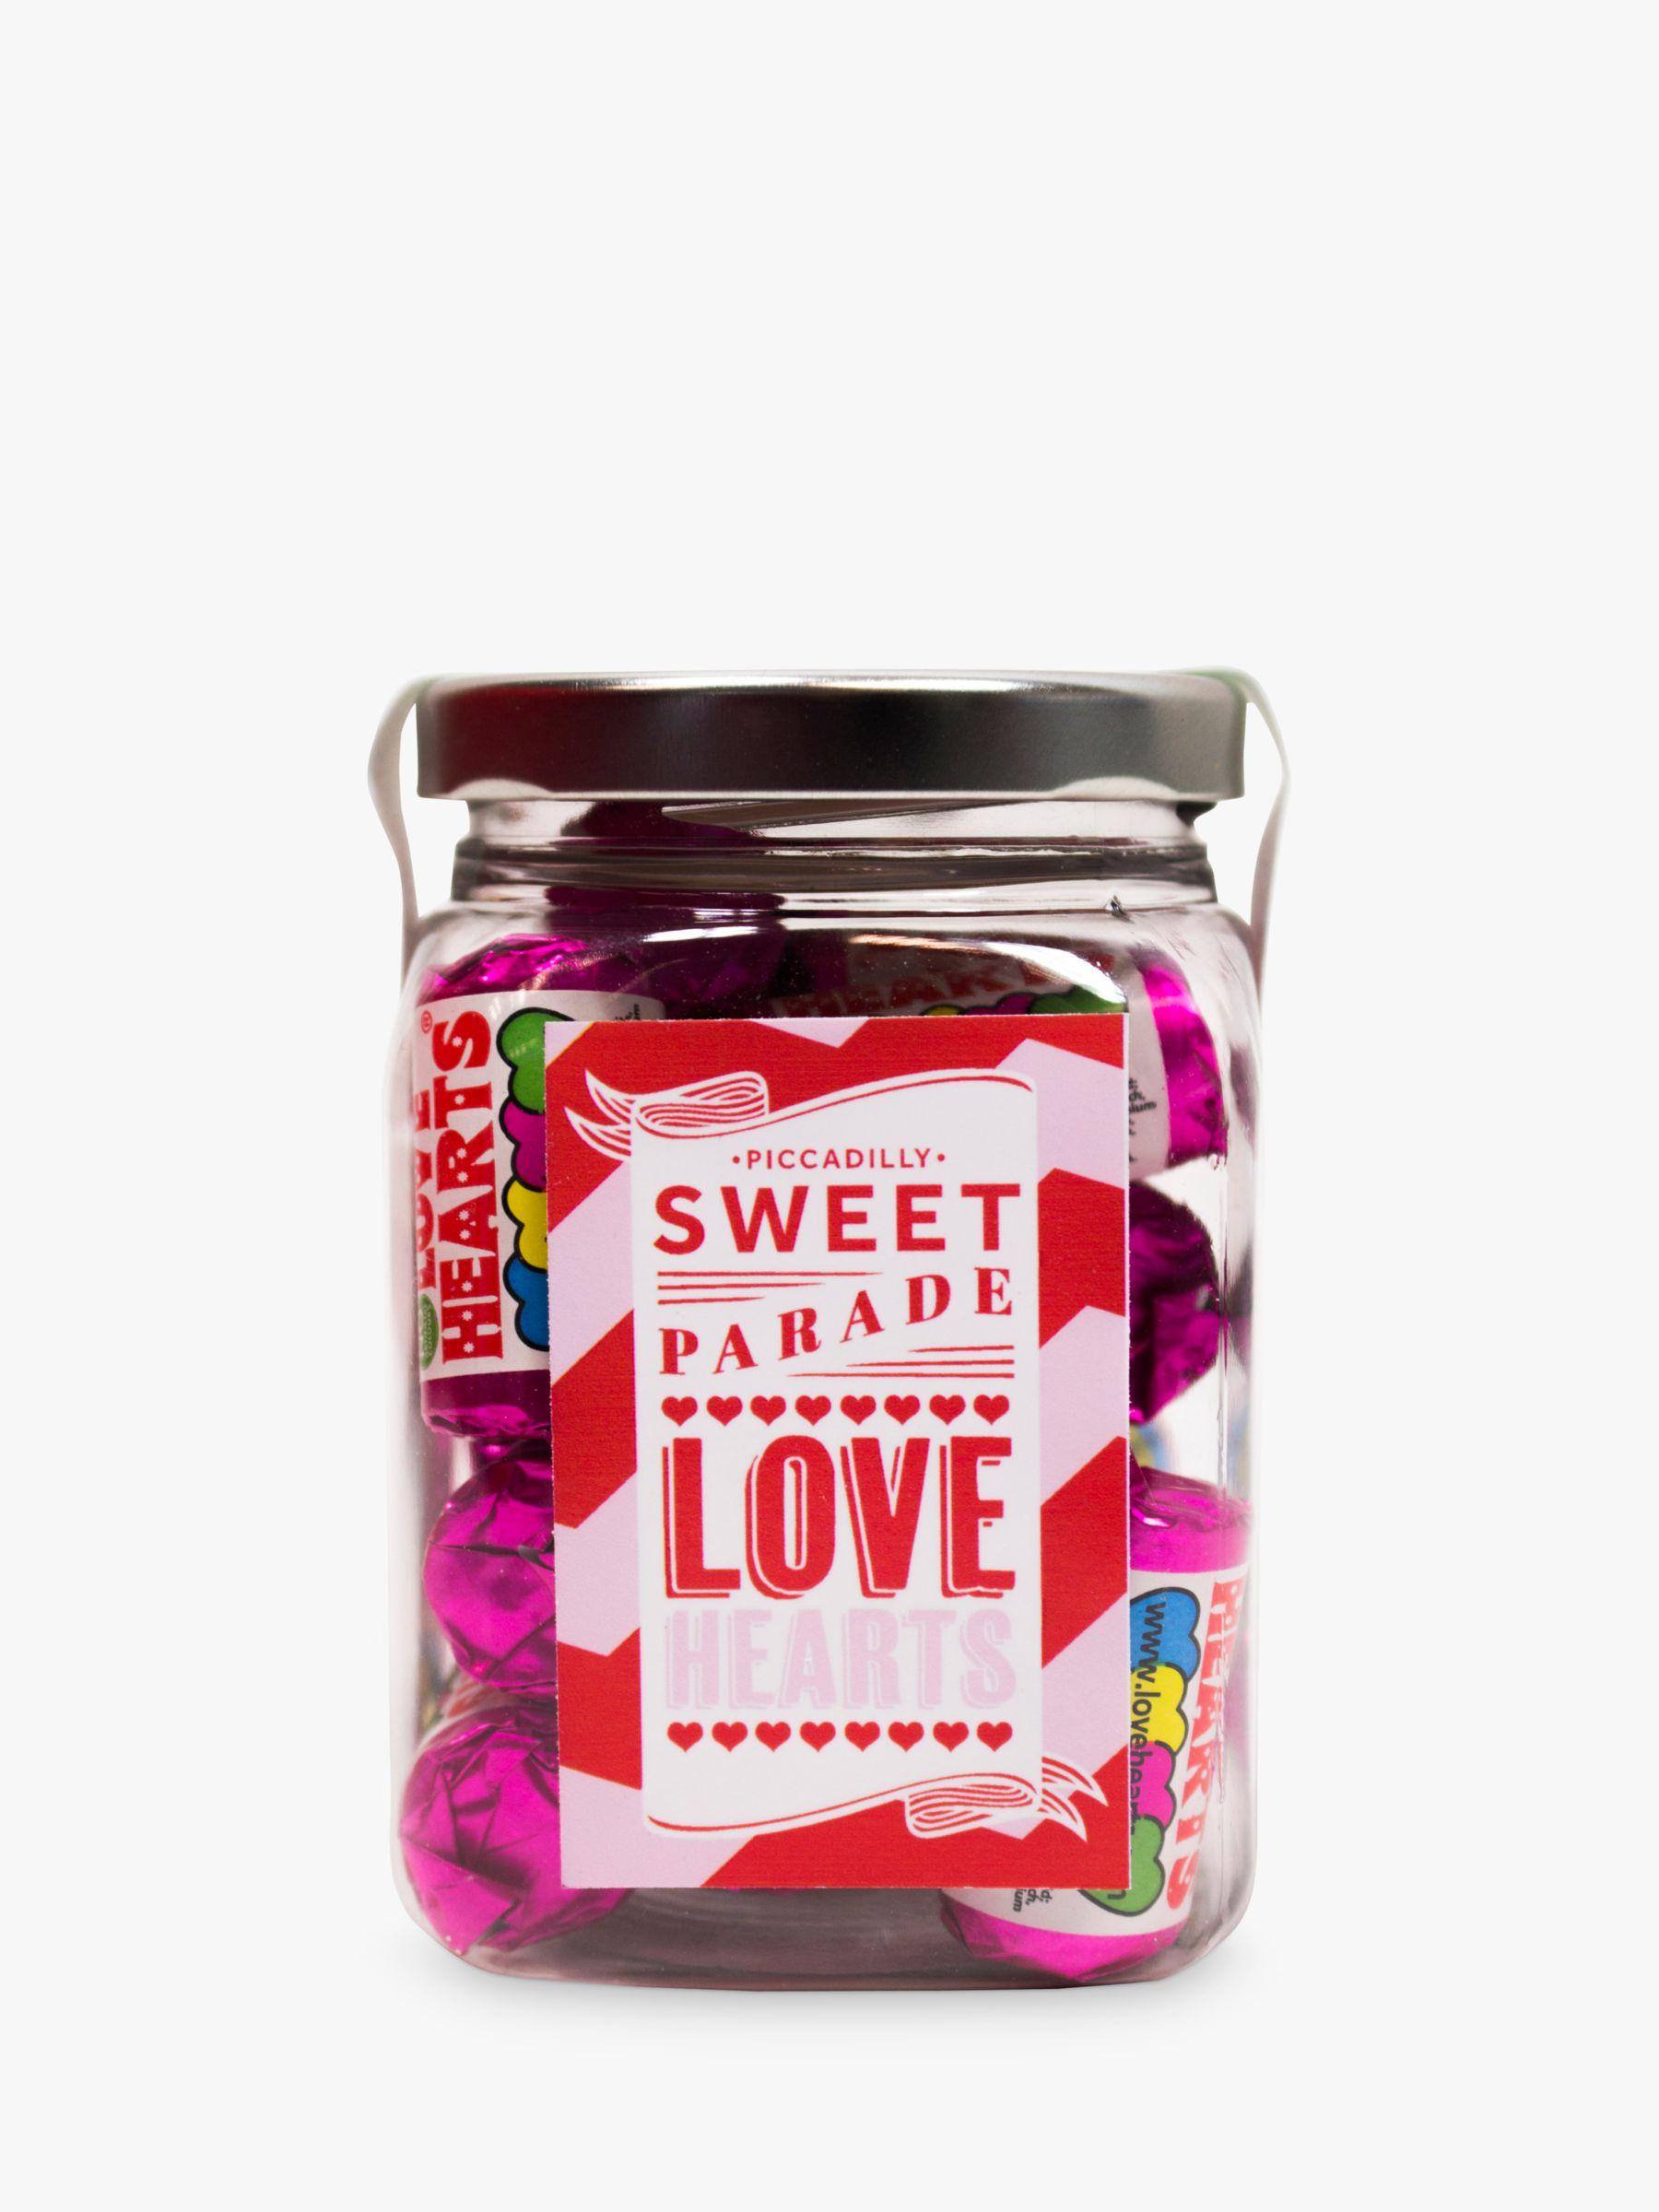 Piccadilly Sweet Parade Piccadilly Sweet Parade 'Love Heart' Sweet Jar, 180g